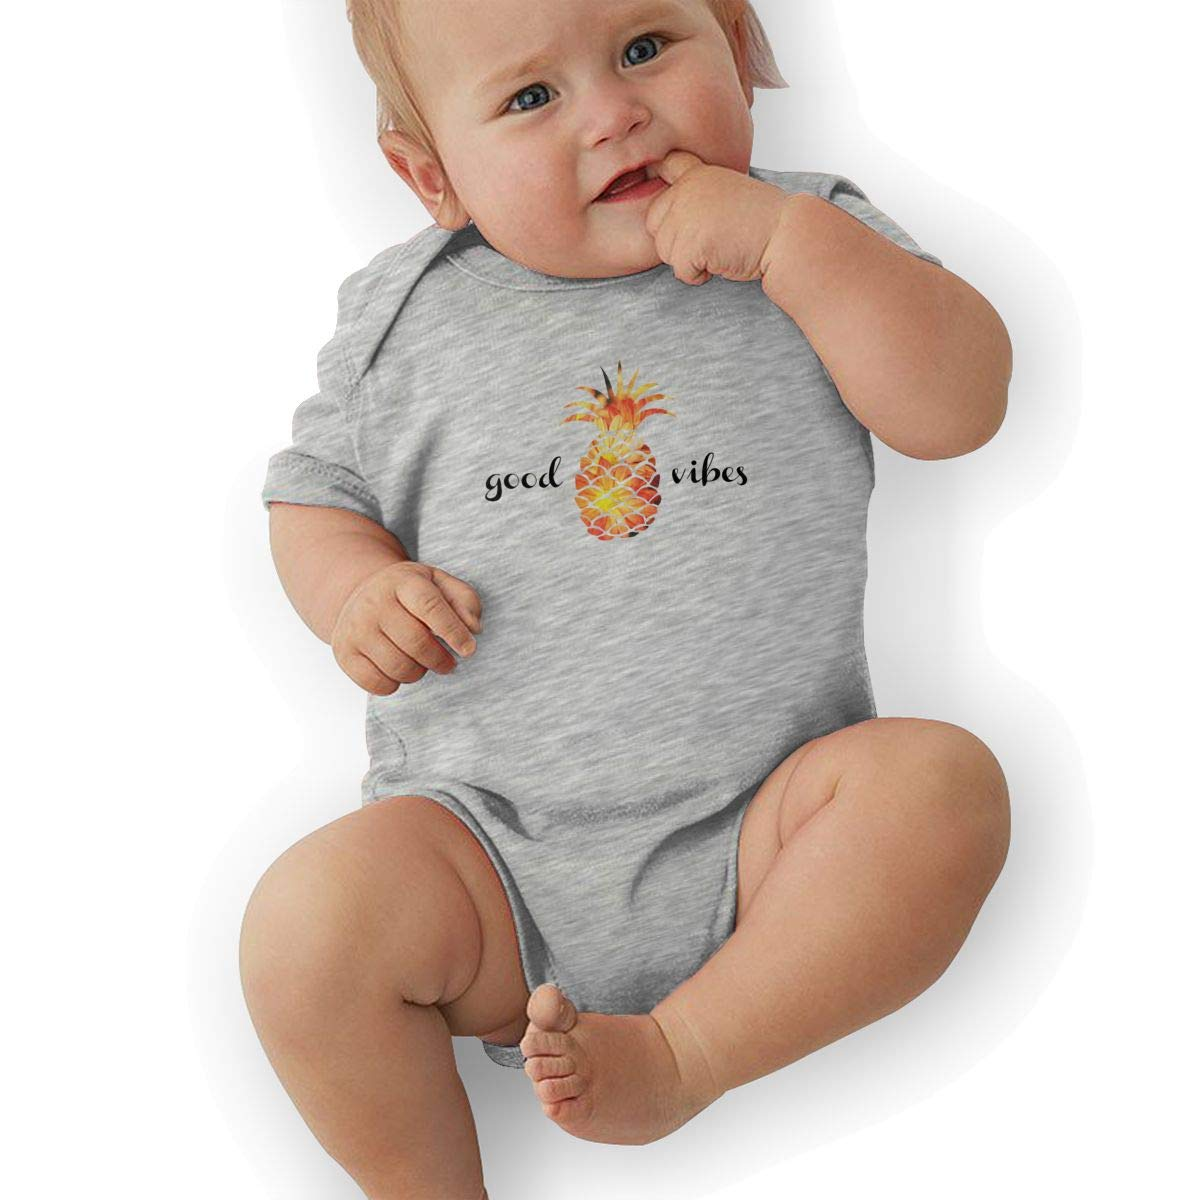 Pineapple Good Vibes Baby Boys Girls Jumpsuits Short Sleeve Romper Bodysuit Bodysuit Jumpsuit Outfits Gray